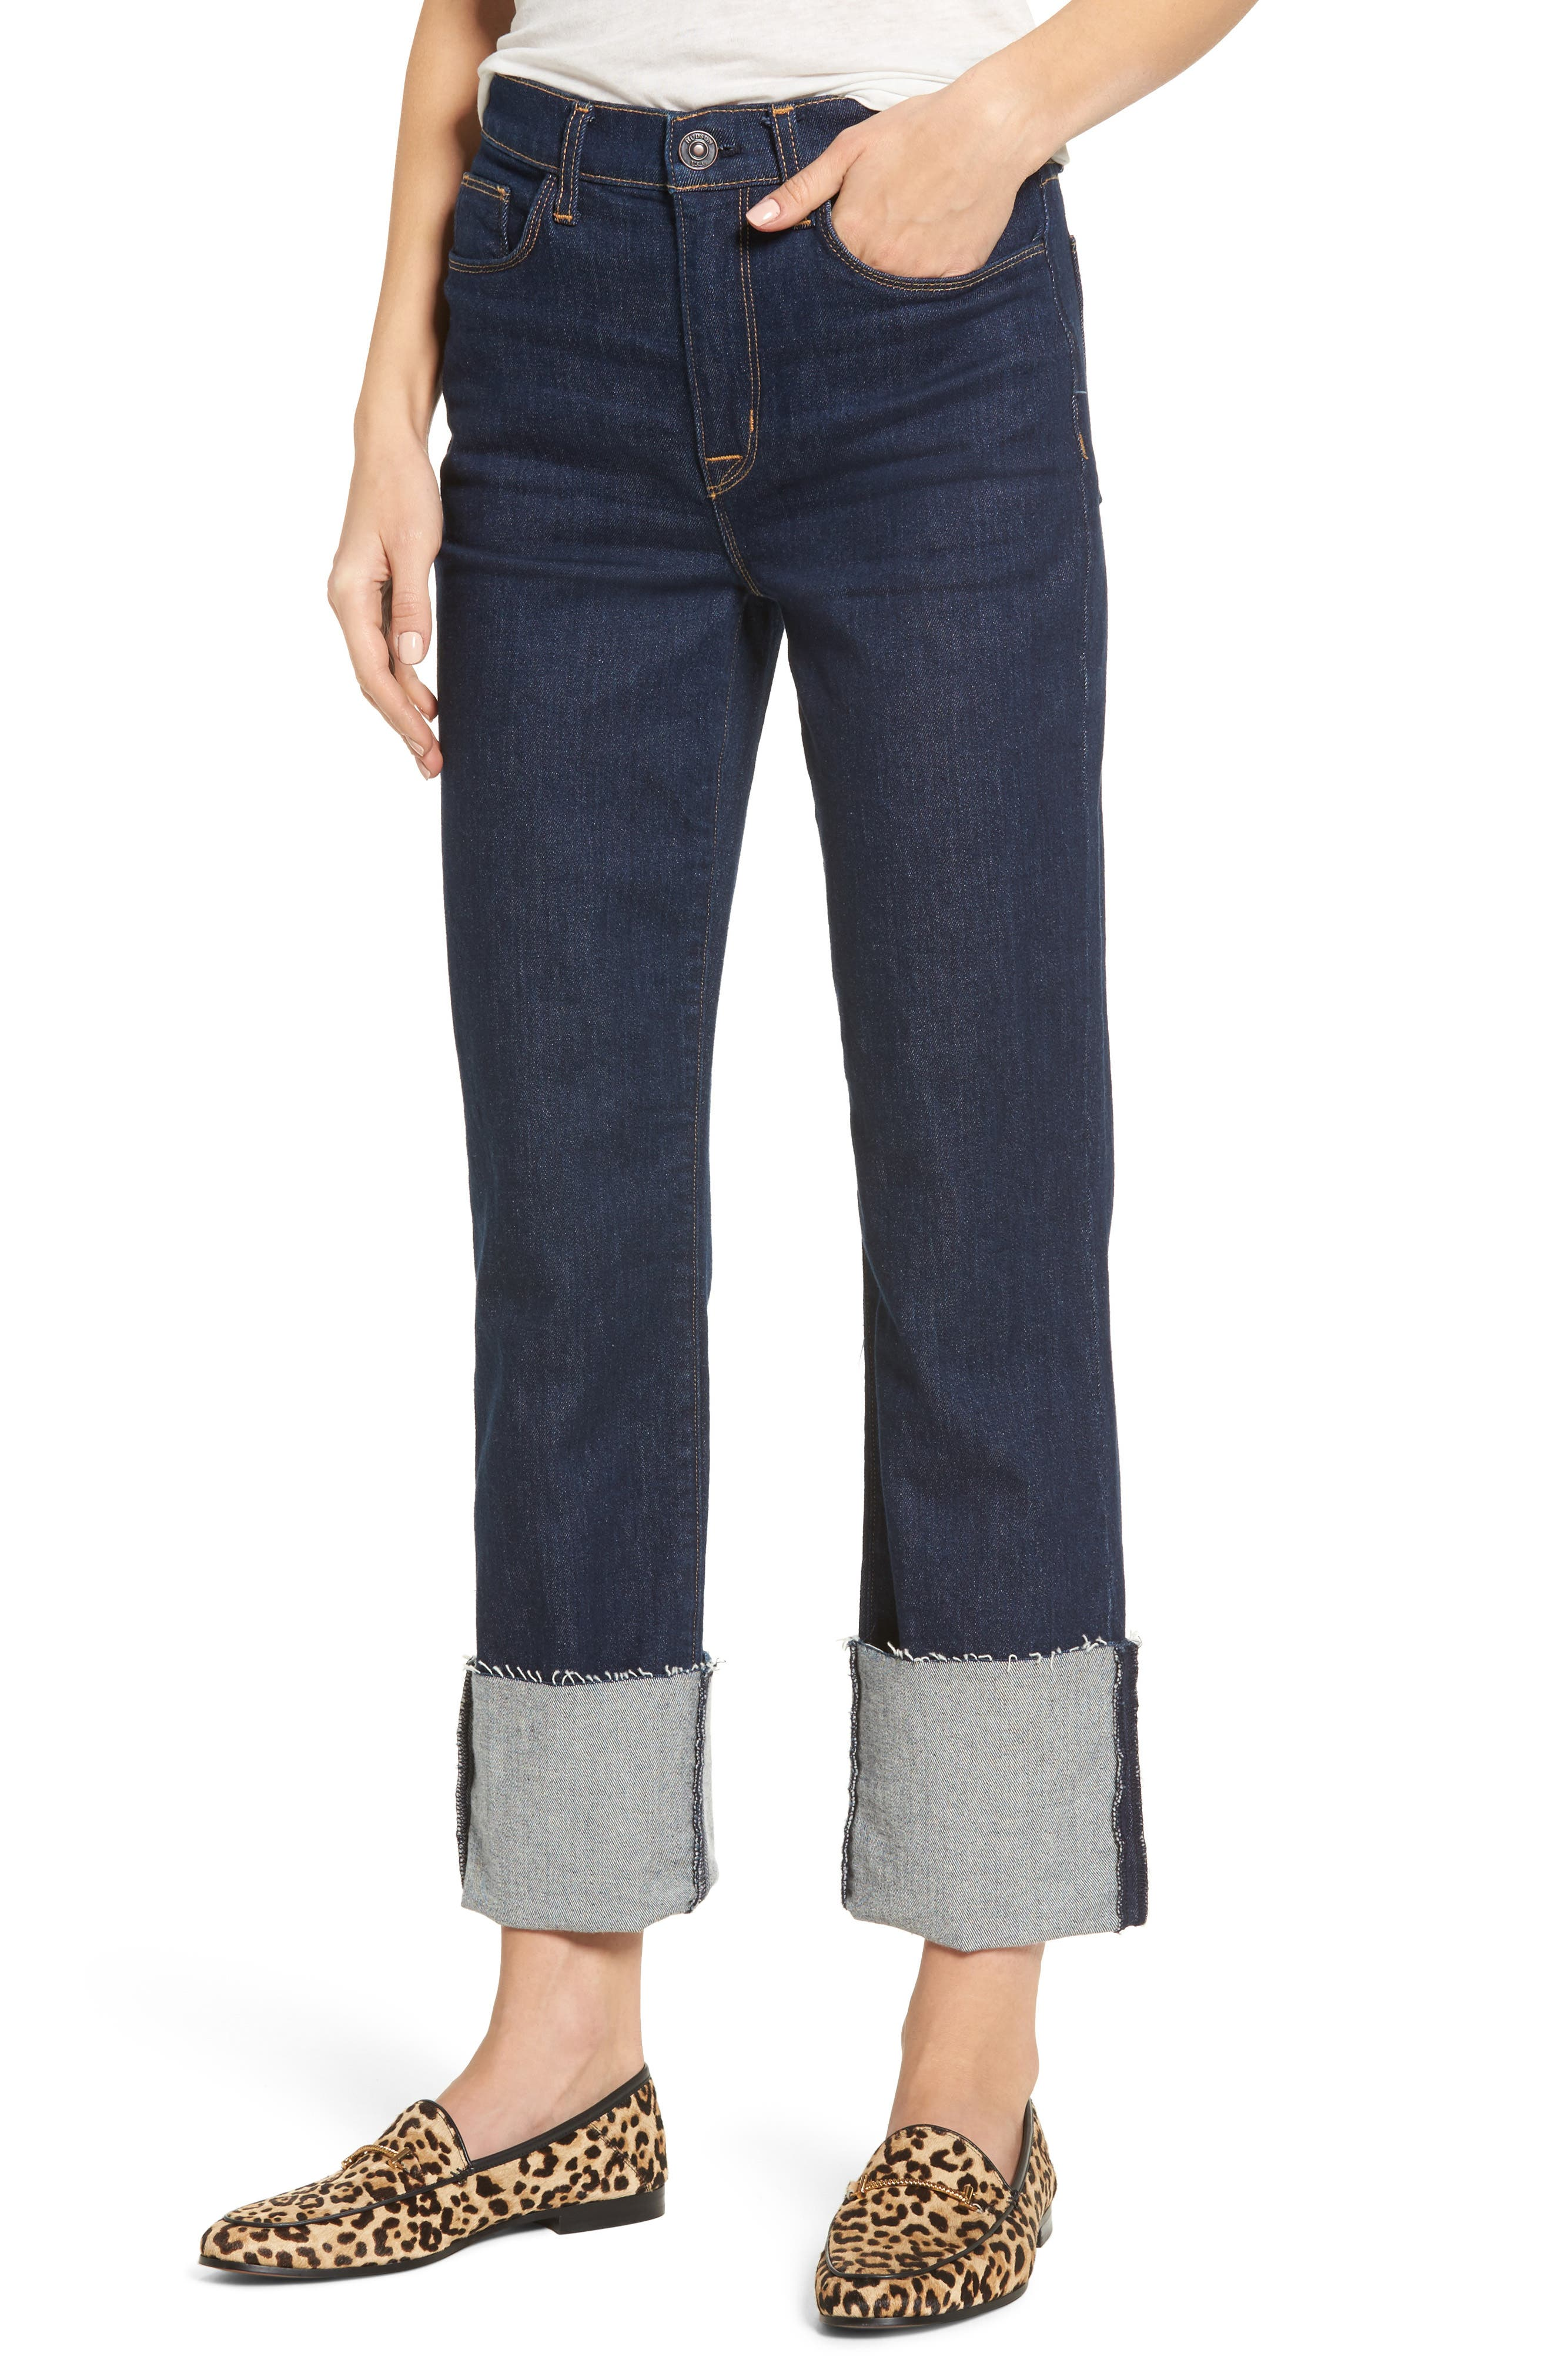 Zoeey High Waist Crop Straight Leg Jeans,                         Main,                         color,